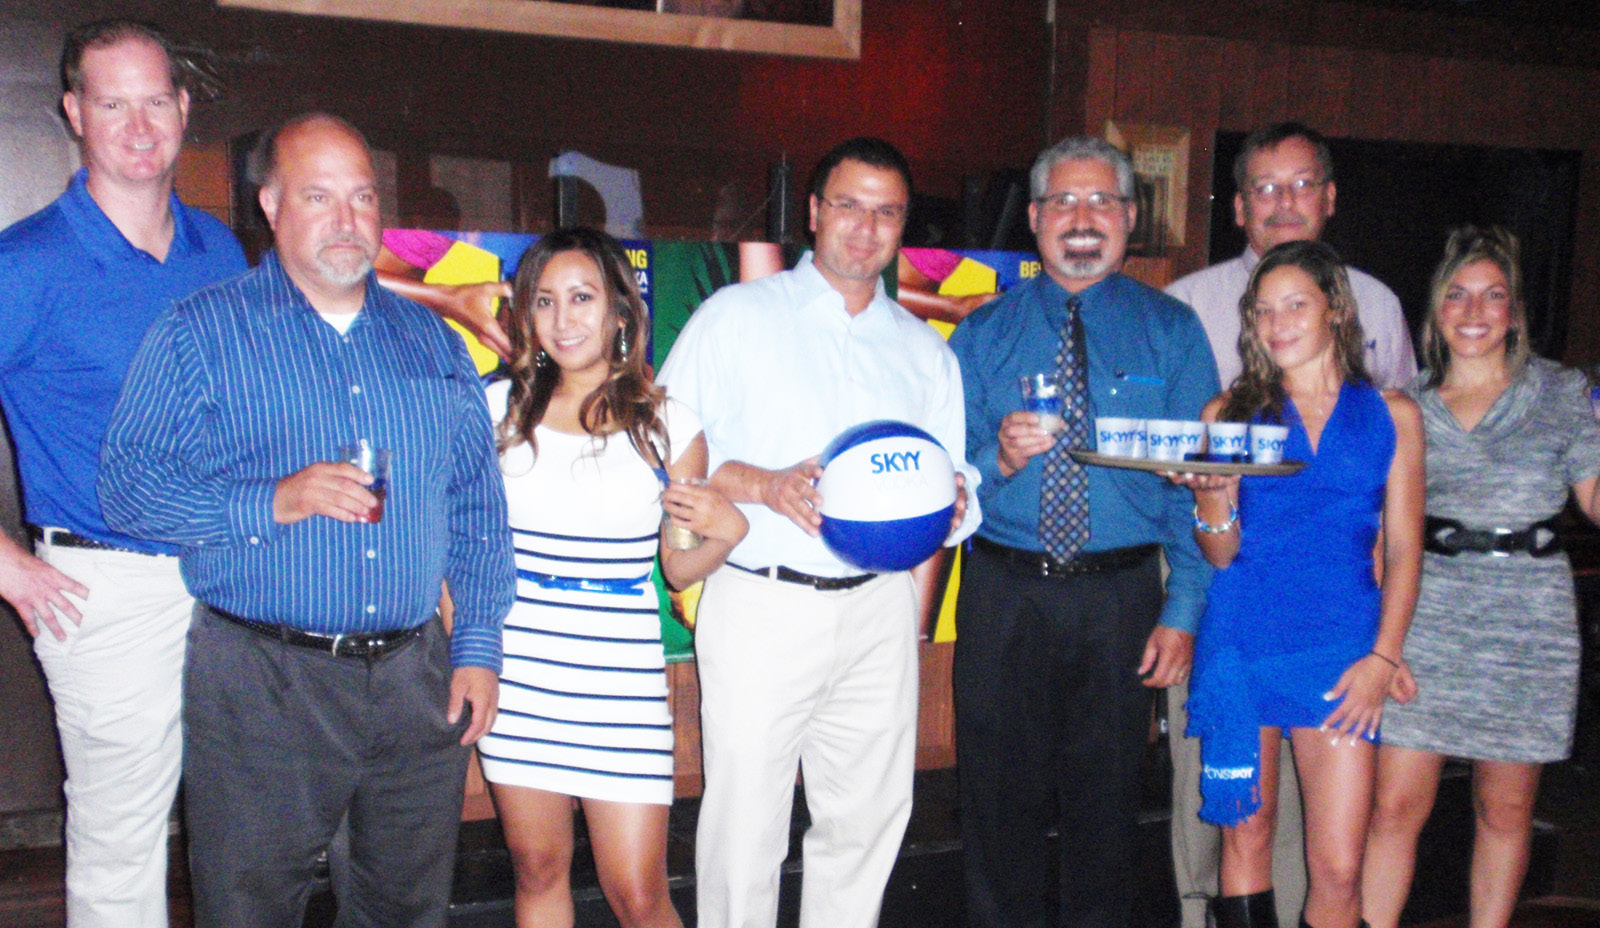 AROUND TOWN: Campari USA Hosts Trade Party